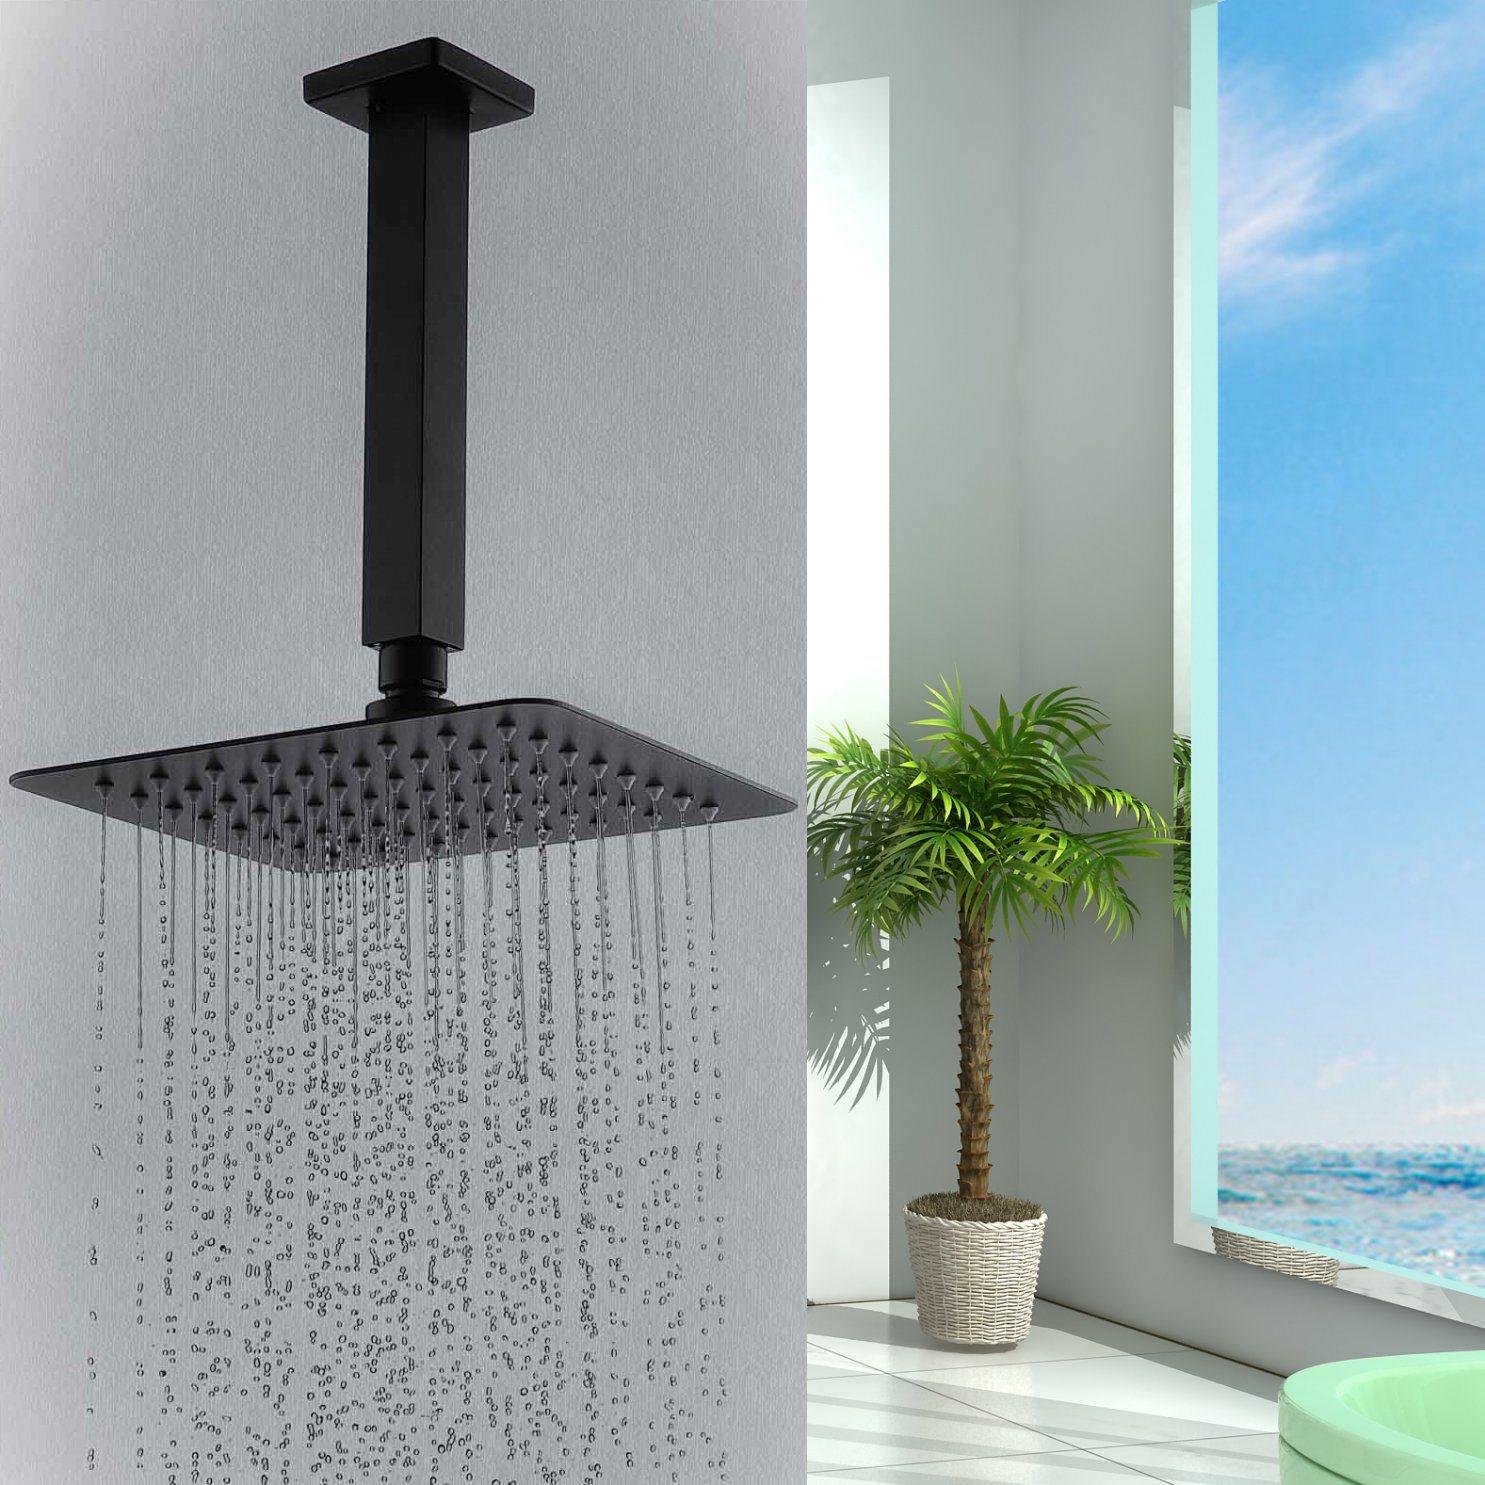 Hot Item Matte Black Square 200mm Overhead Rain Shower Head